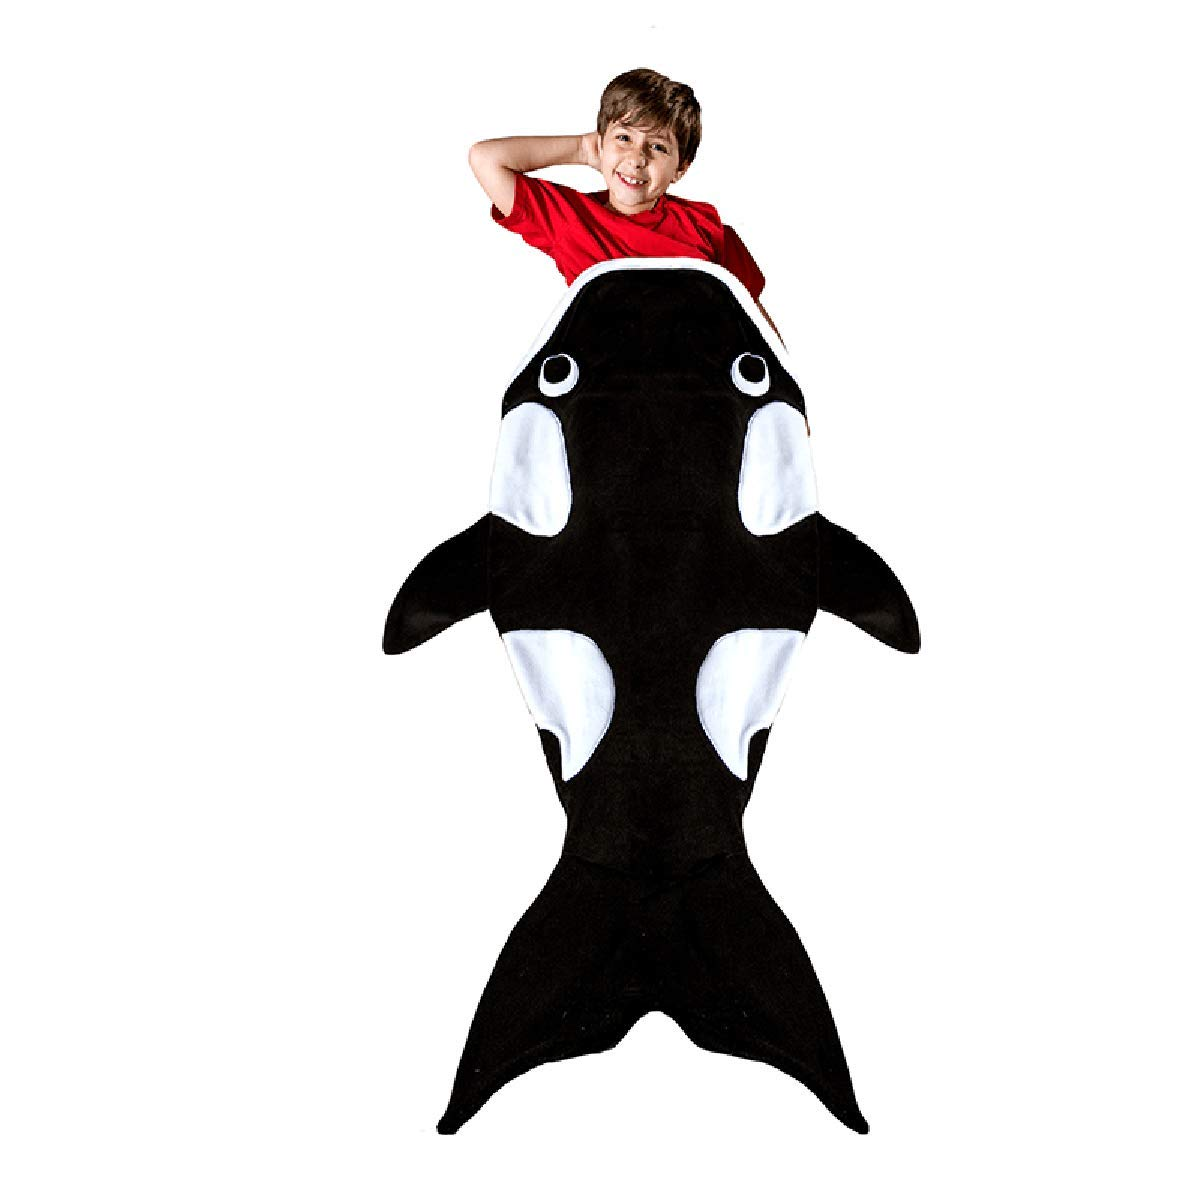 Orca Whale毛布の子   B076KZT9KM